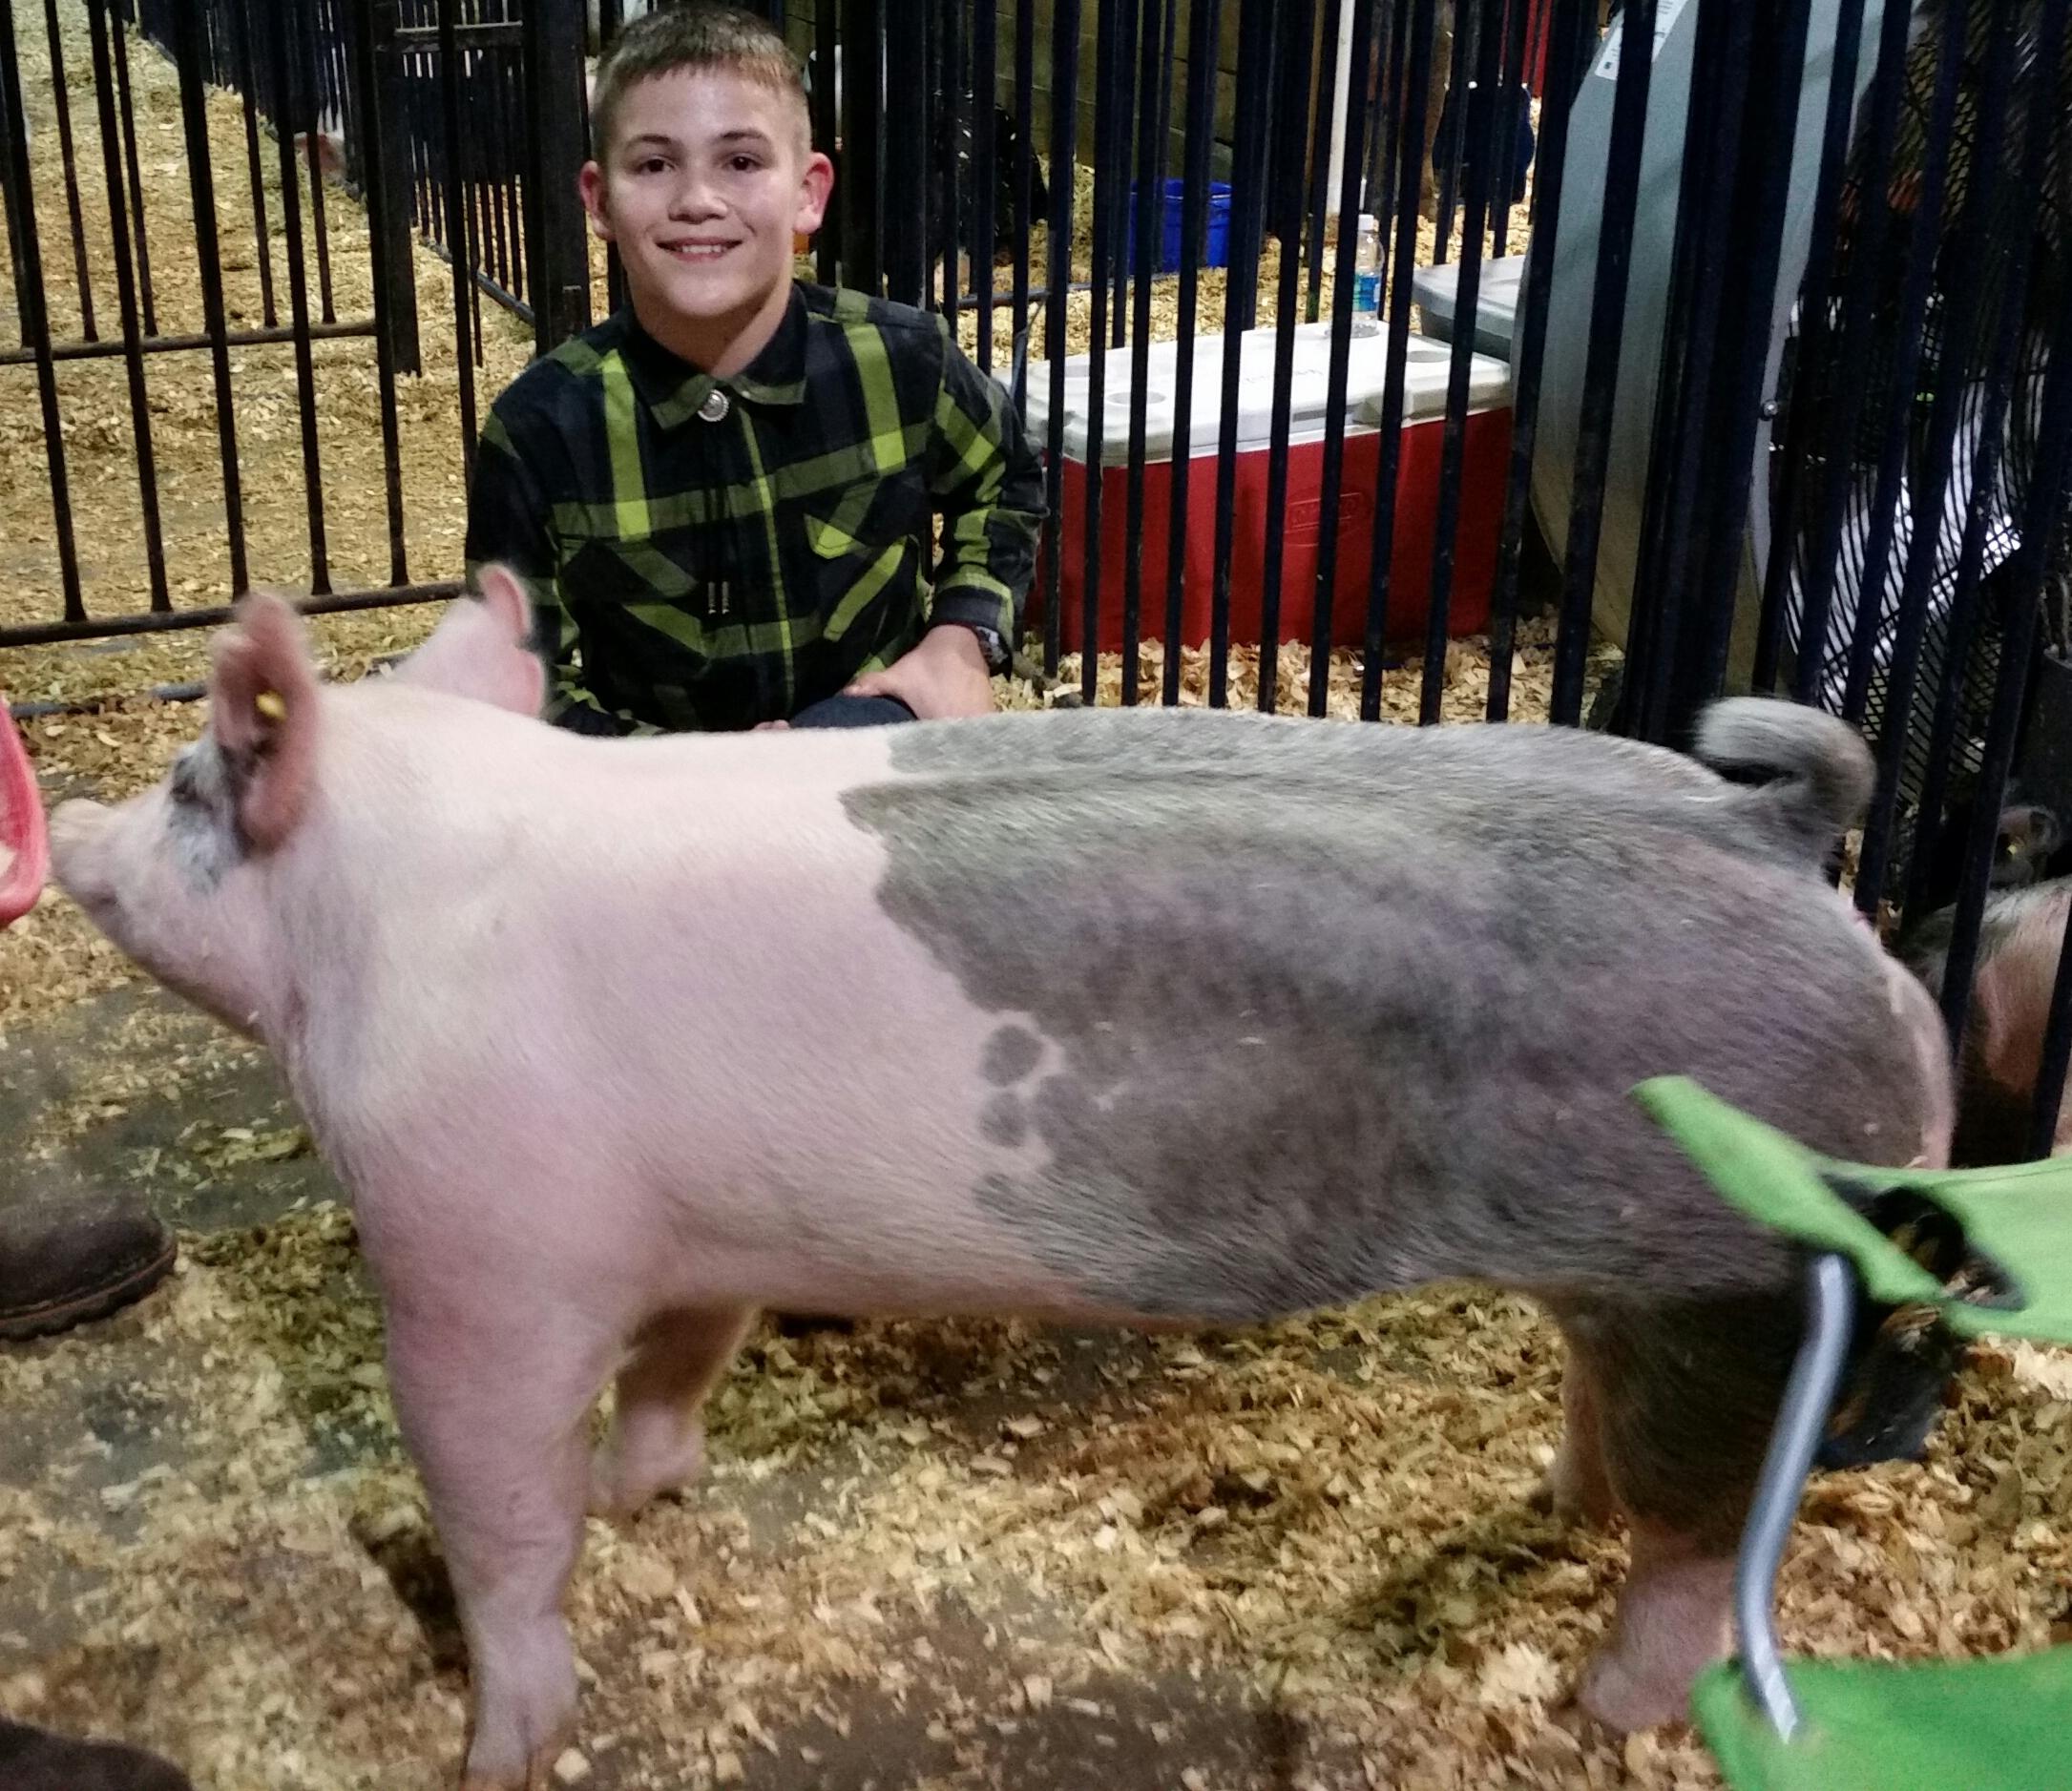 Kalan Lusk 2017 TN State Market Hog Show 1st in Class